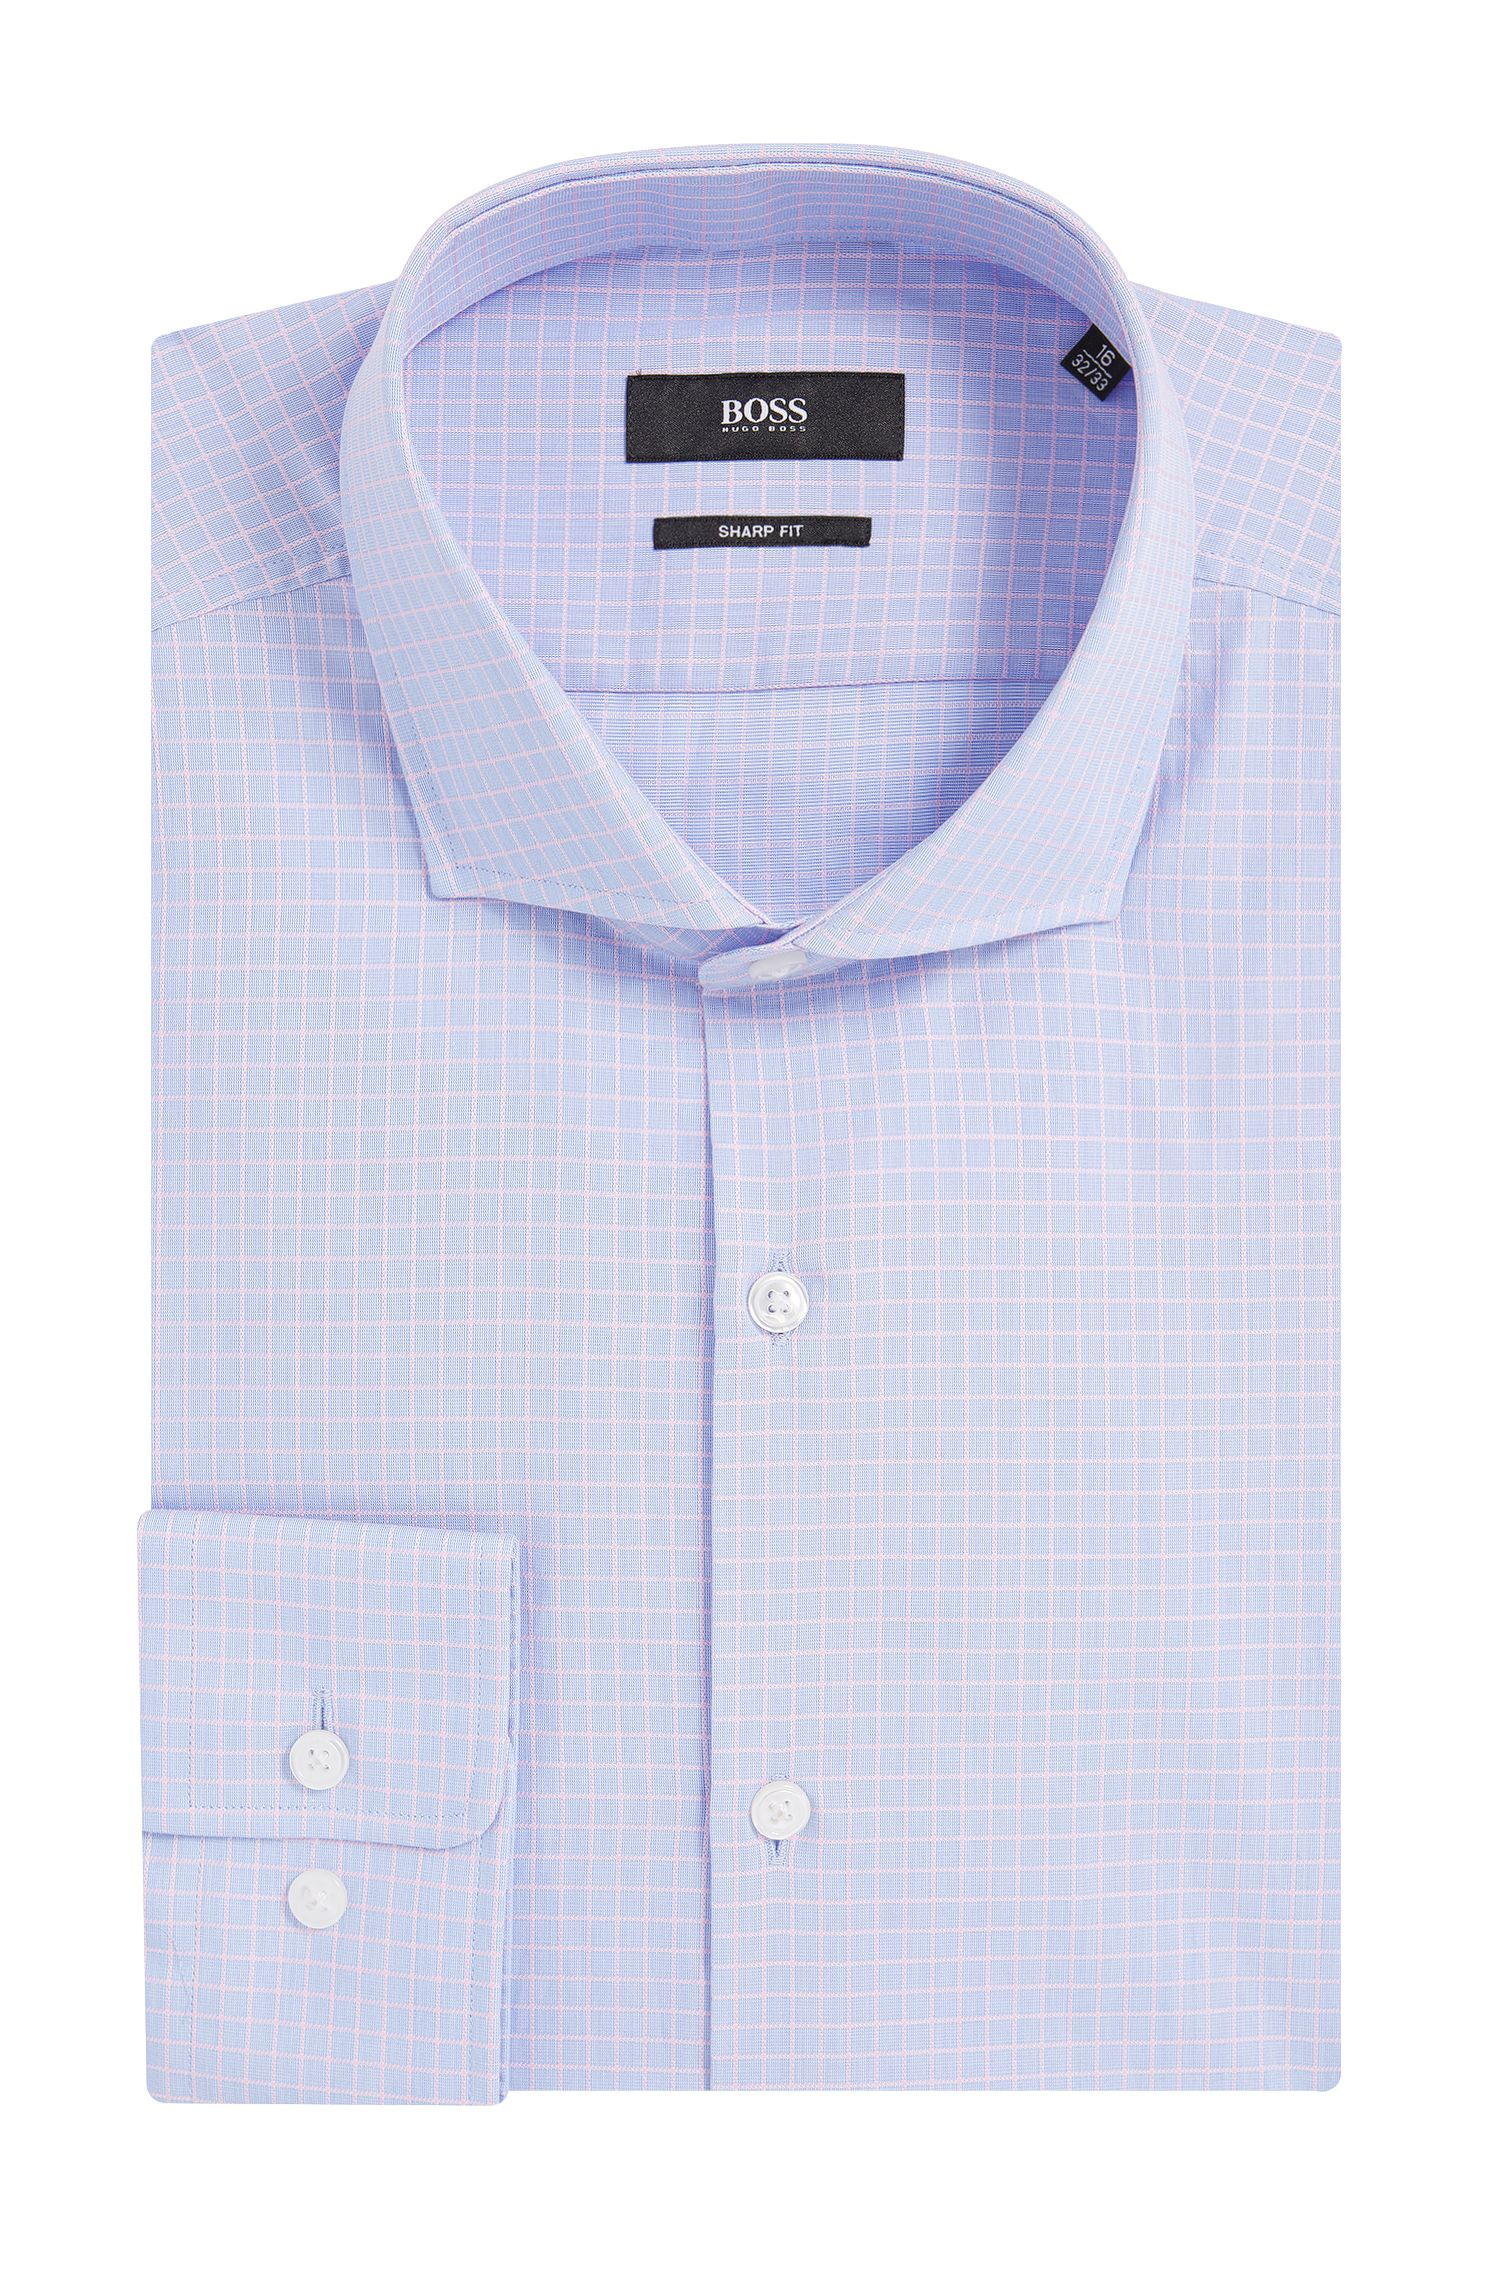 Windowpane Cotton Dress Shirt, Sharp Fit | Mark US